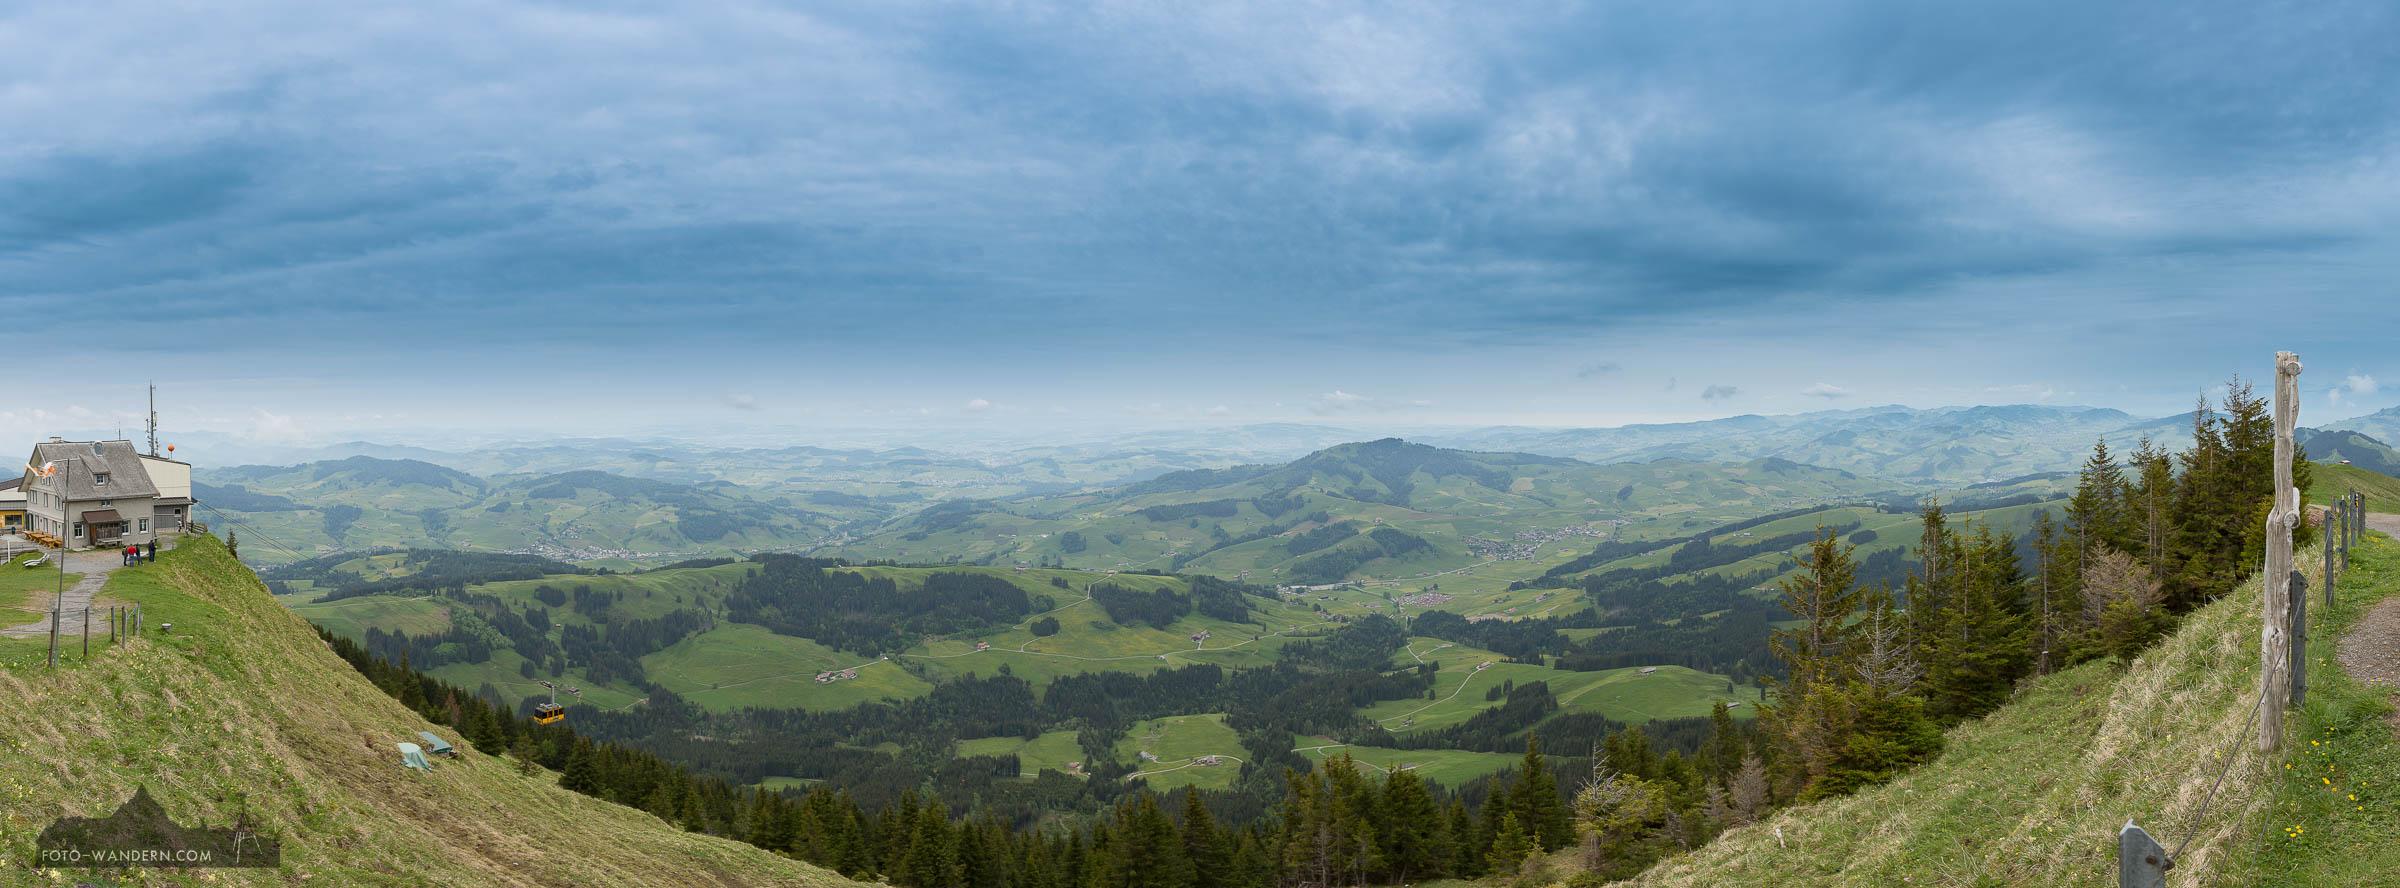 Kronberg im Appenzellerland © Andreas Levi - Foto-Wandern.com